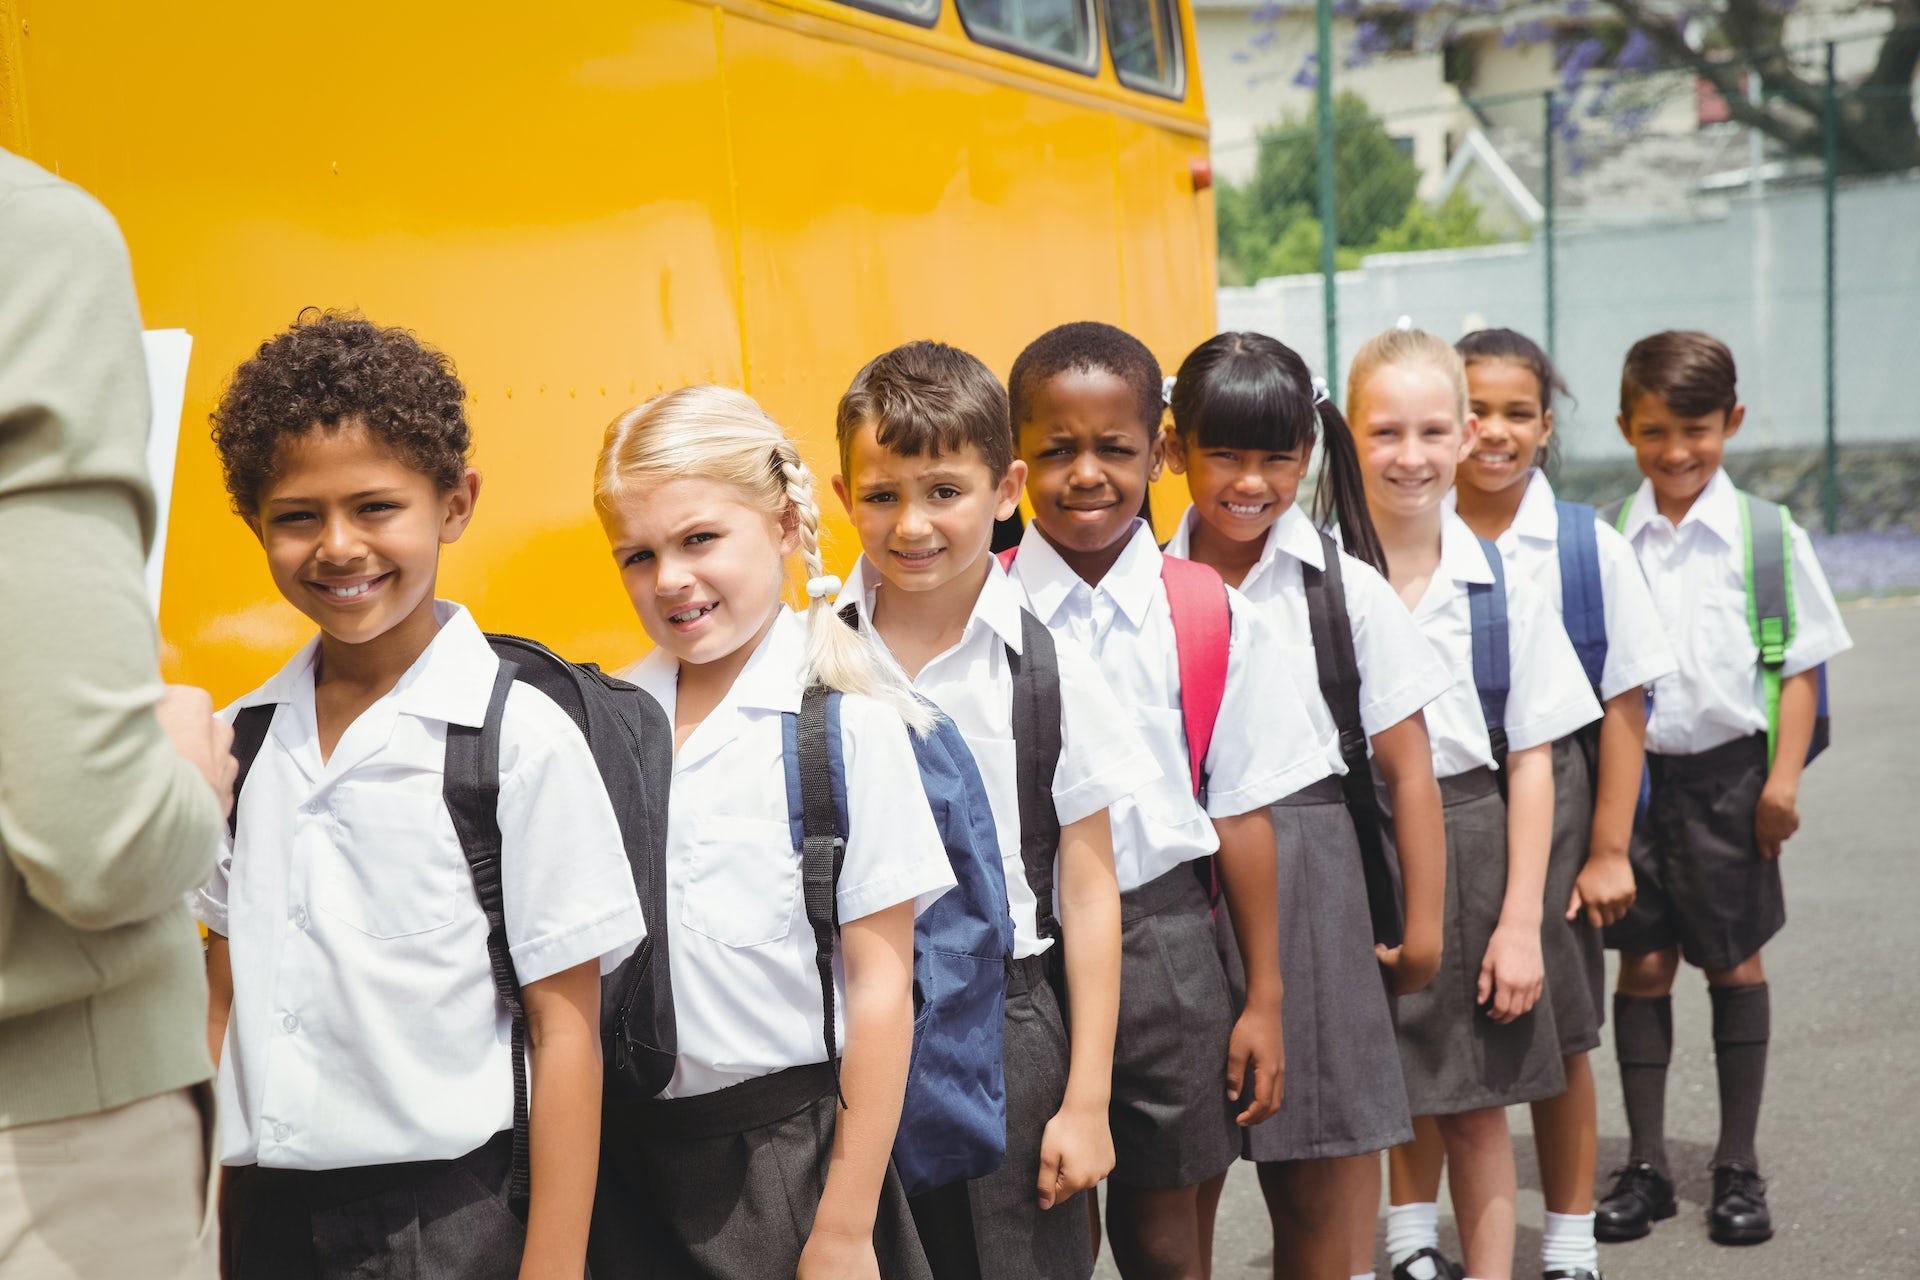 importance of school uniform debate